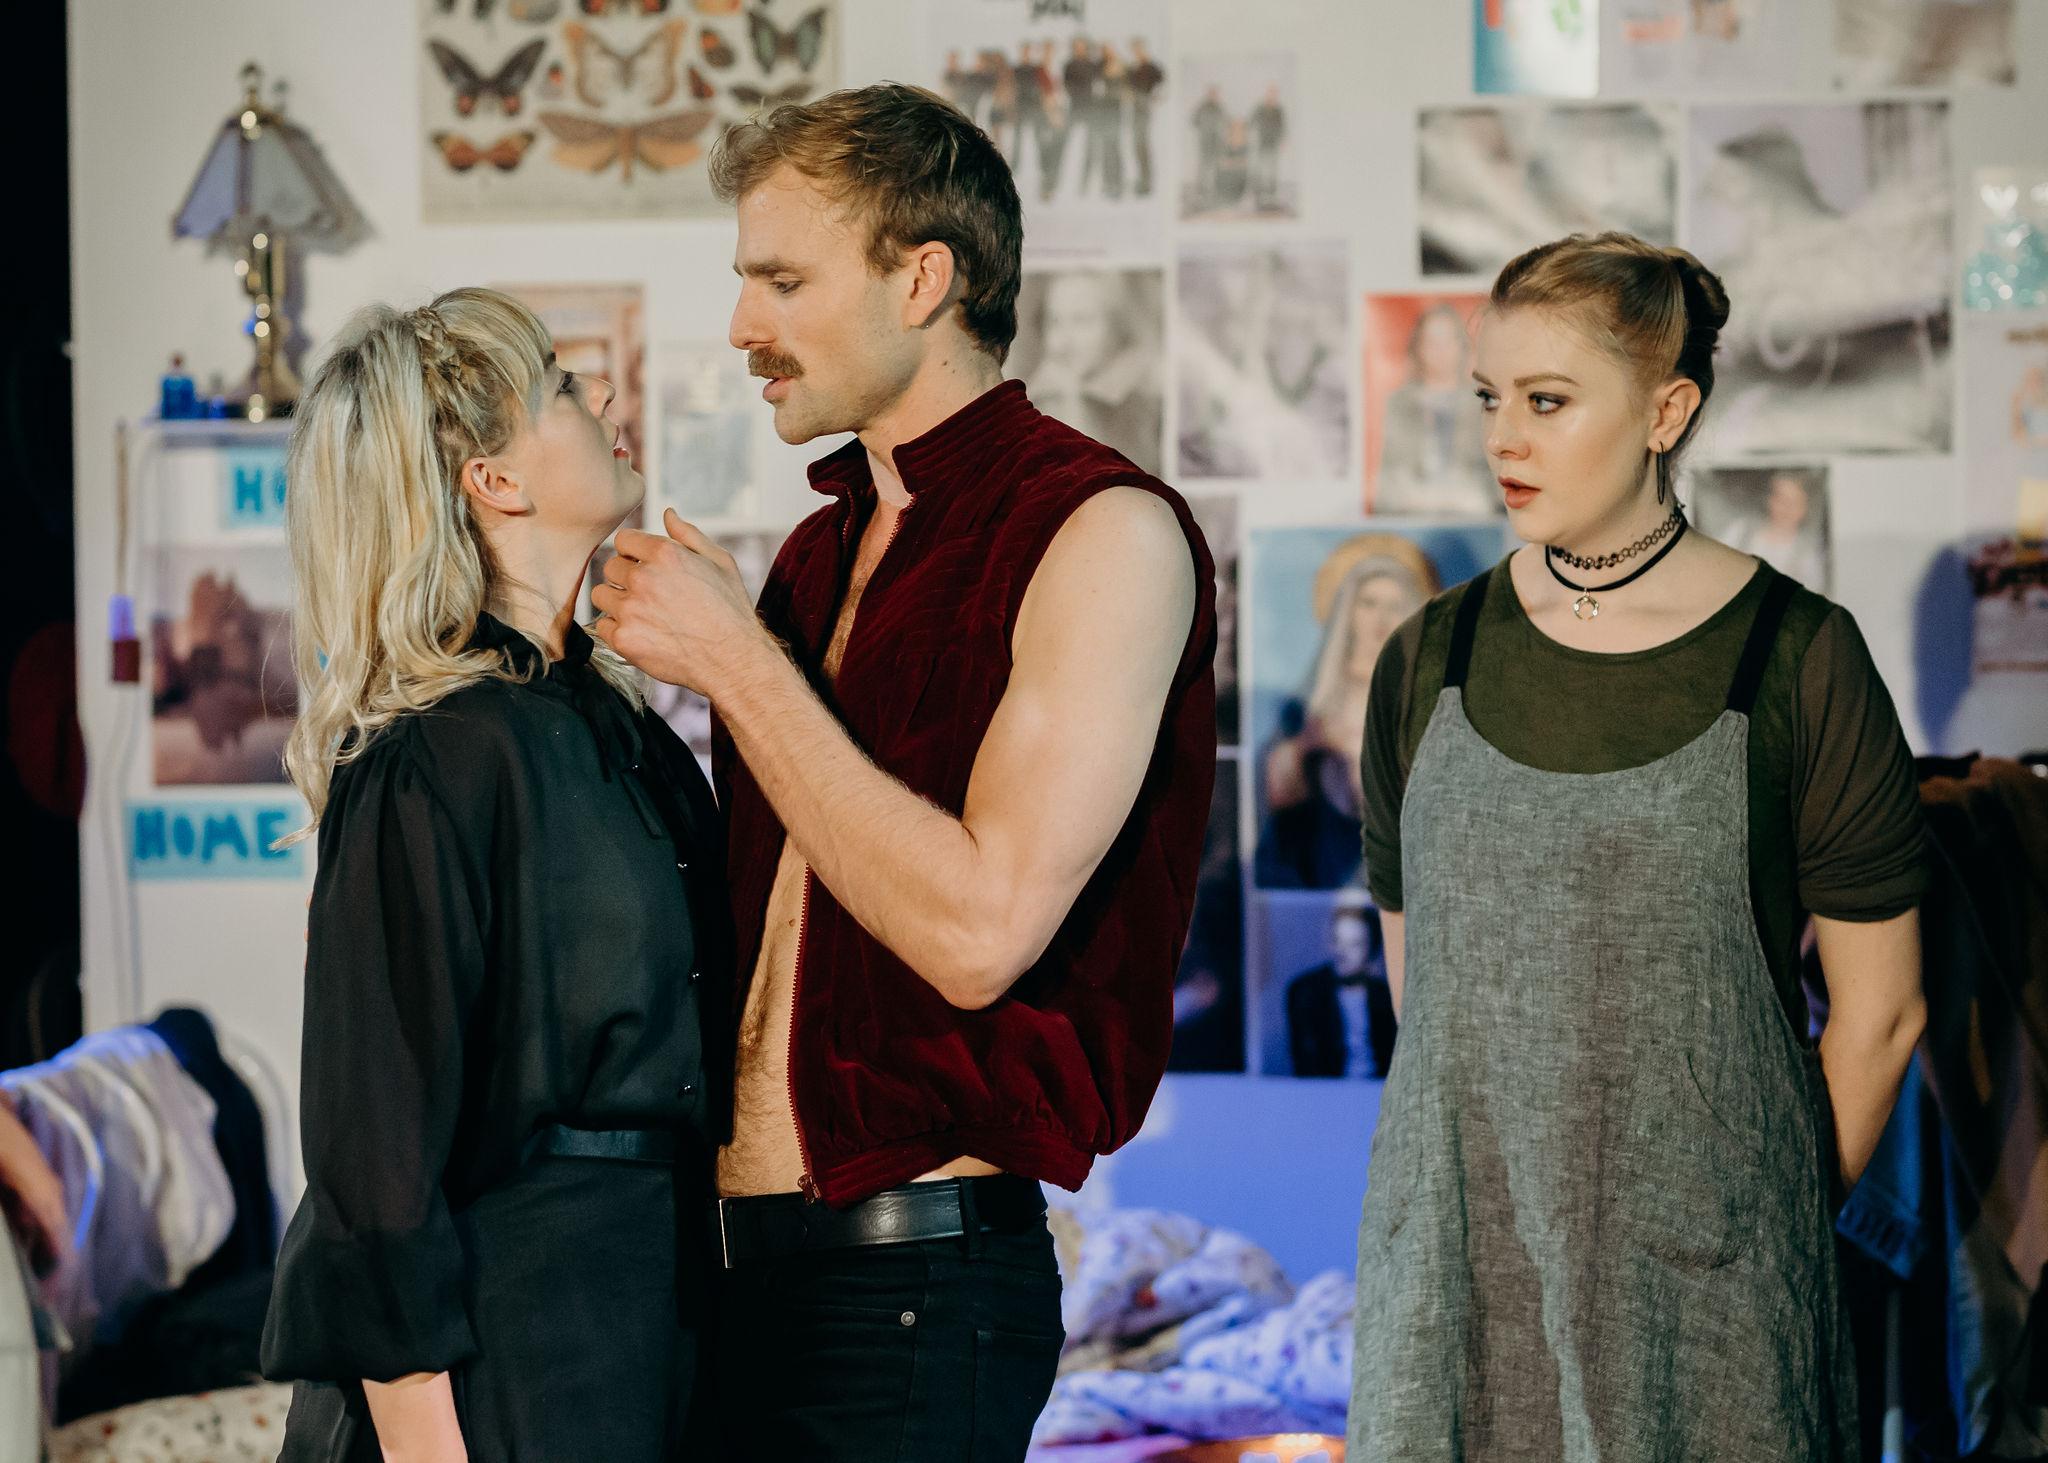 Sarah Clarke as Ophelia, Leigh Scully as Hamlet and Ruby Lauret as Maid. Image: Jack Dixon-Gunn